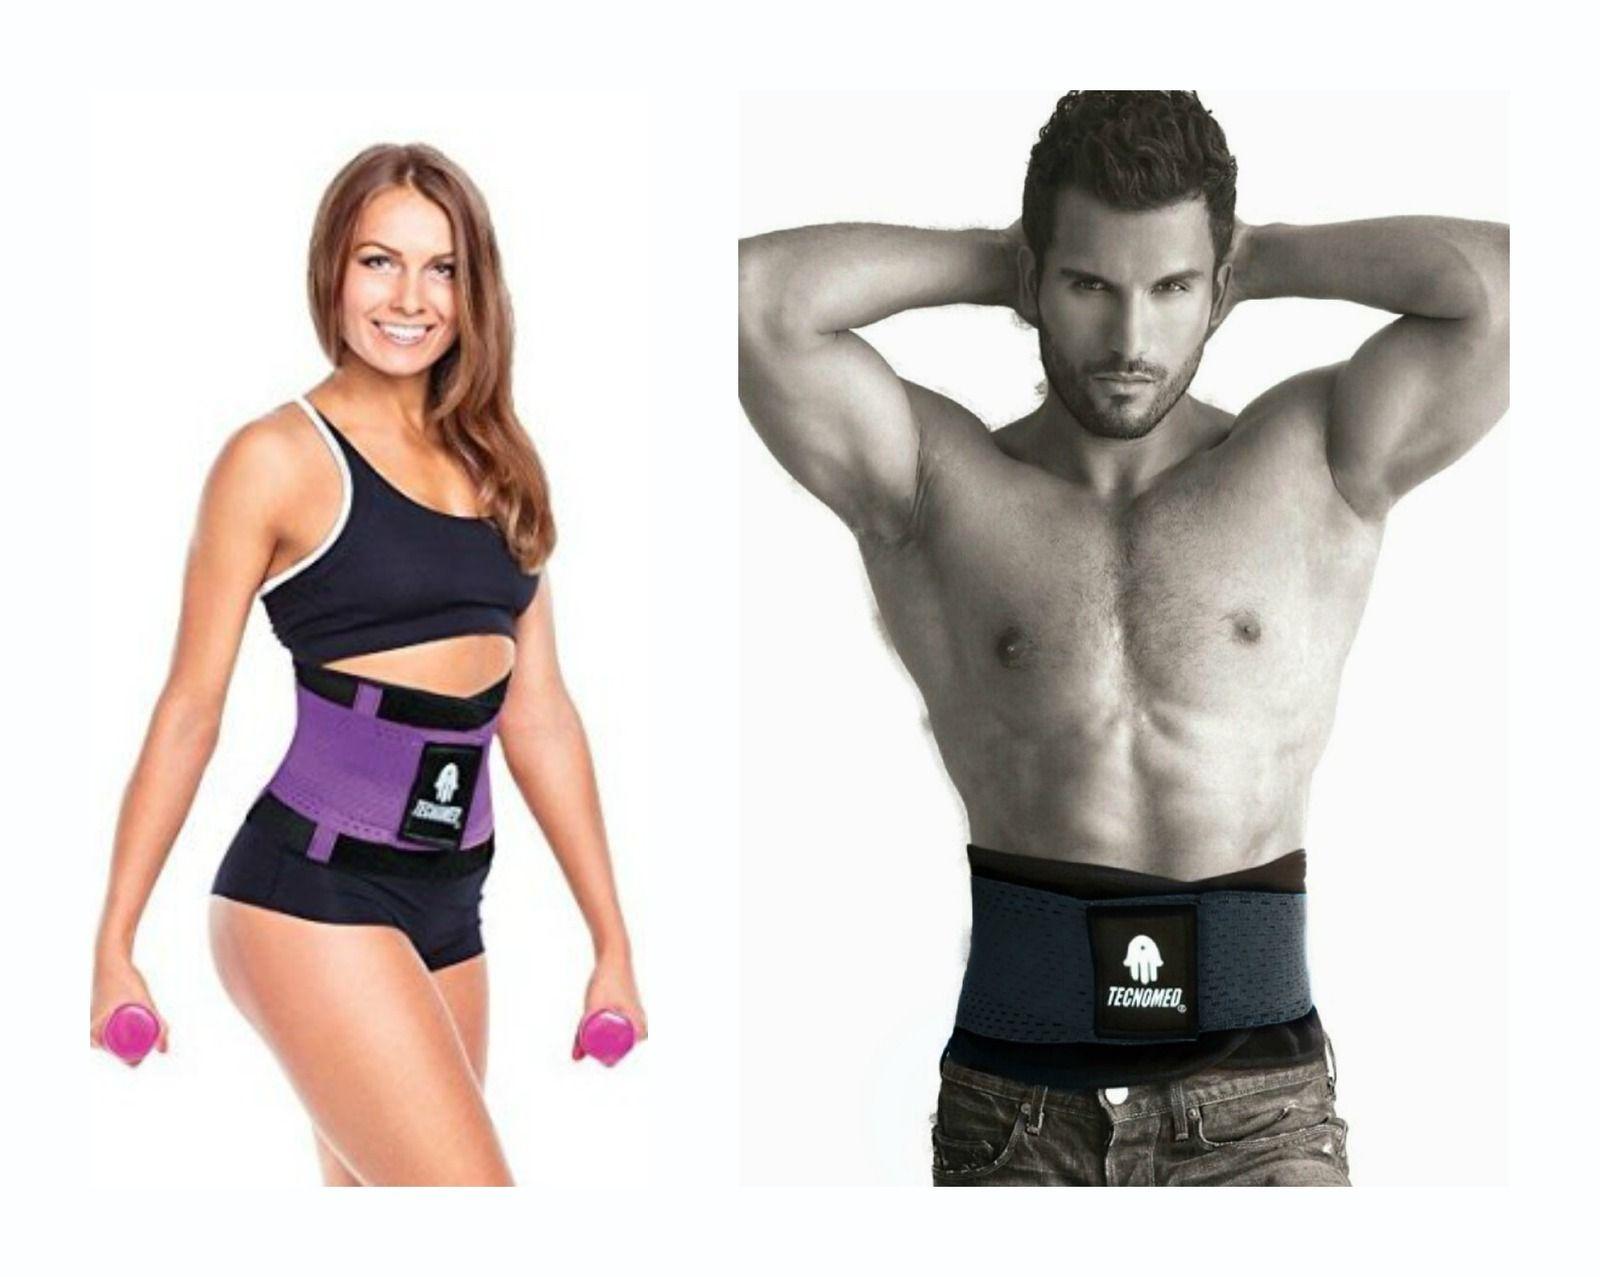 e97f4cccef Tecnomed Body Shaper Fitness Belt - Back Supporter ~ Purple or Black Unisex  ALL SIZES! SALE